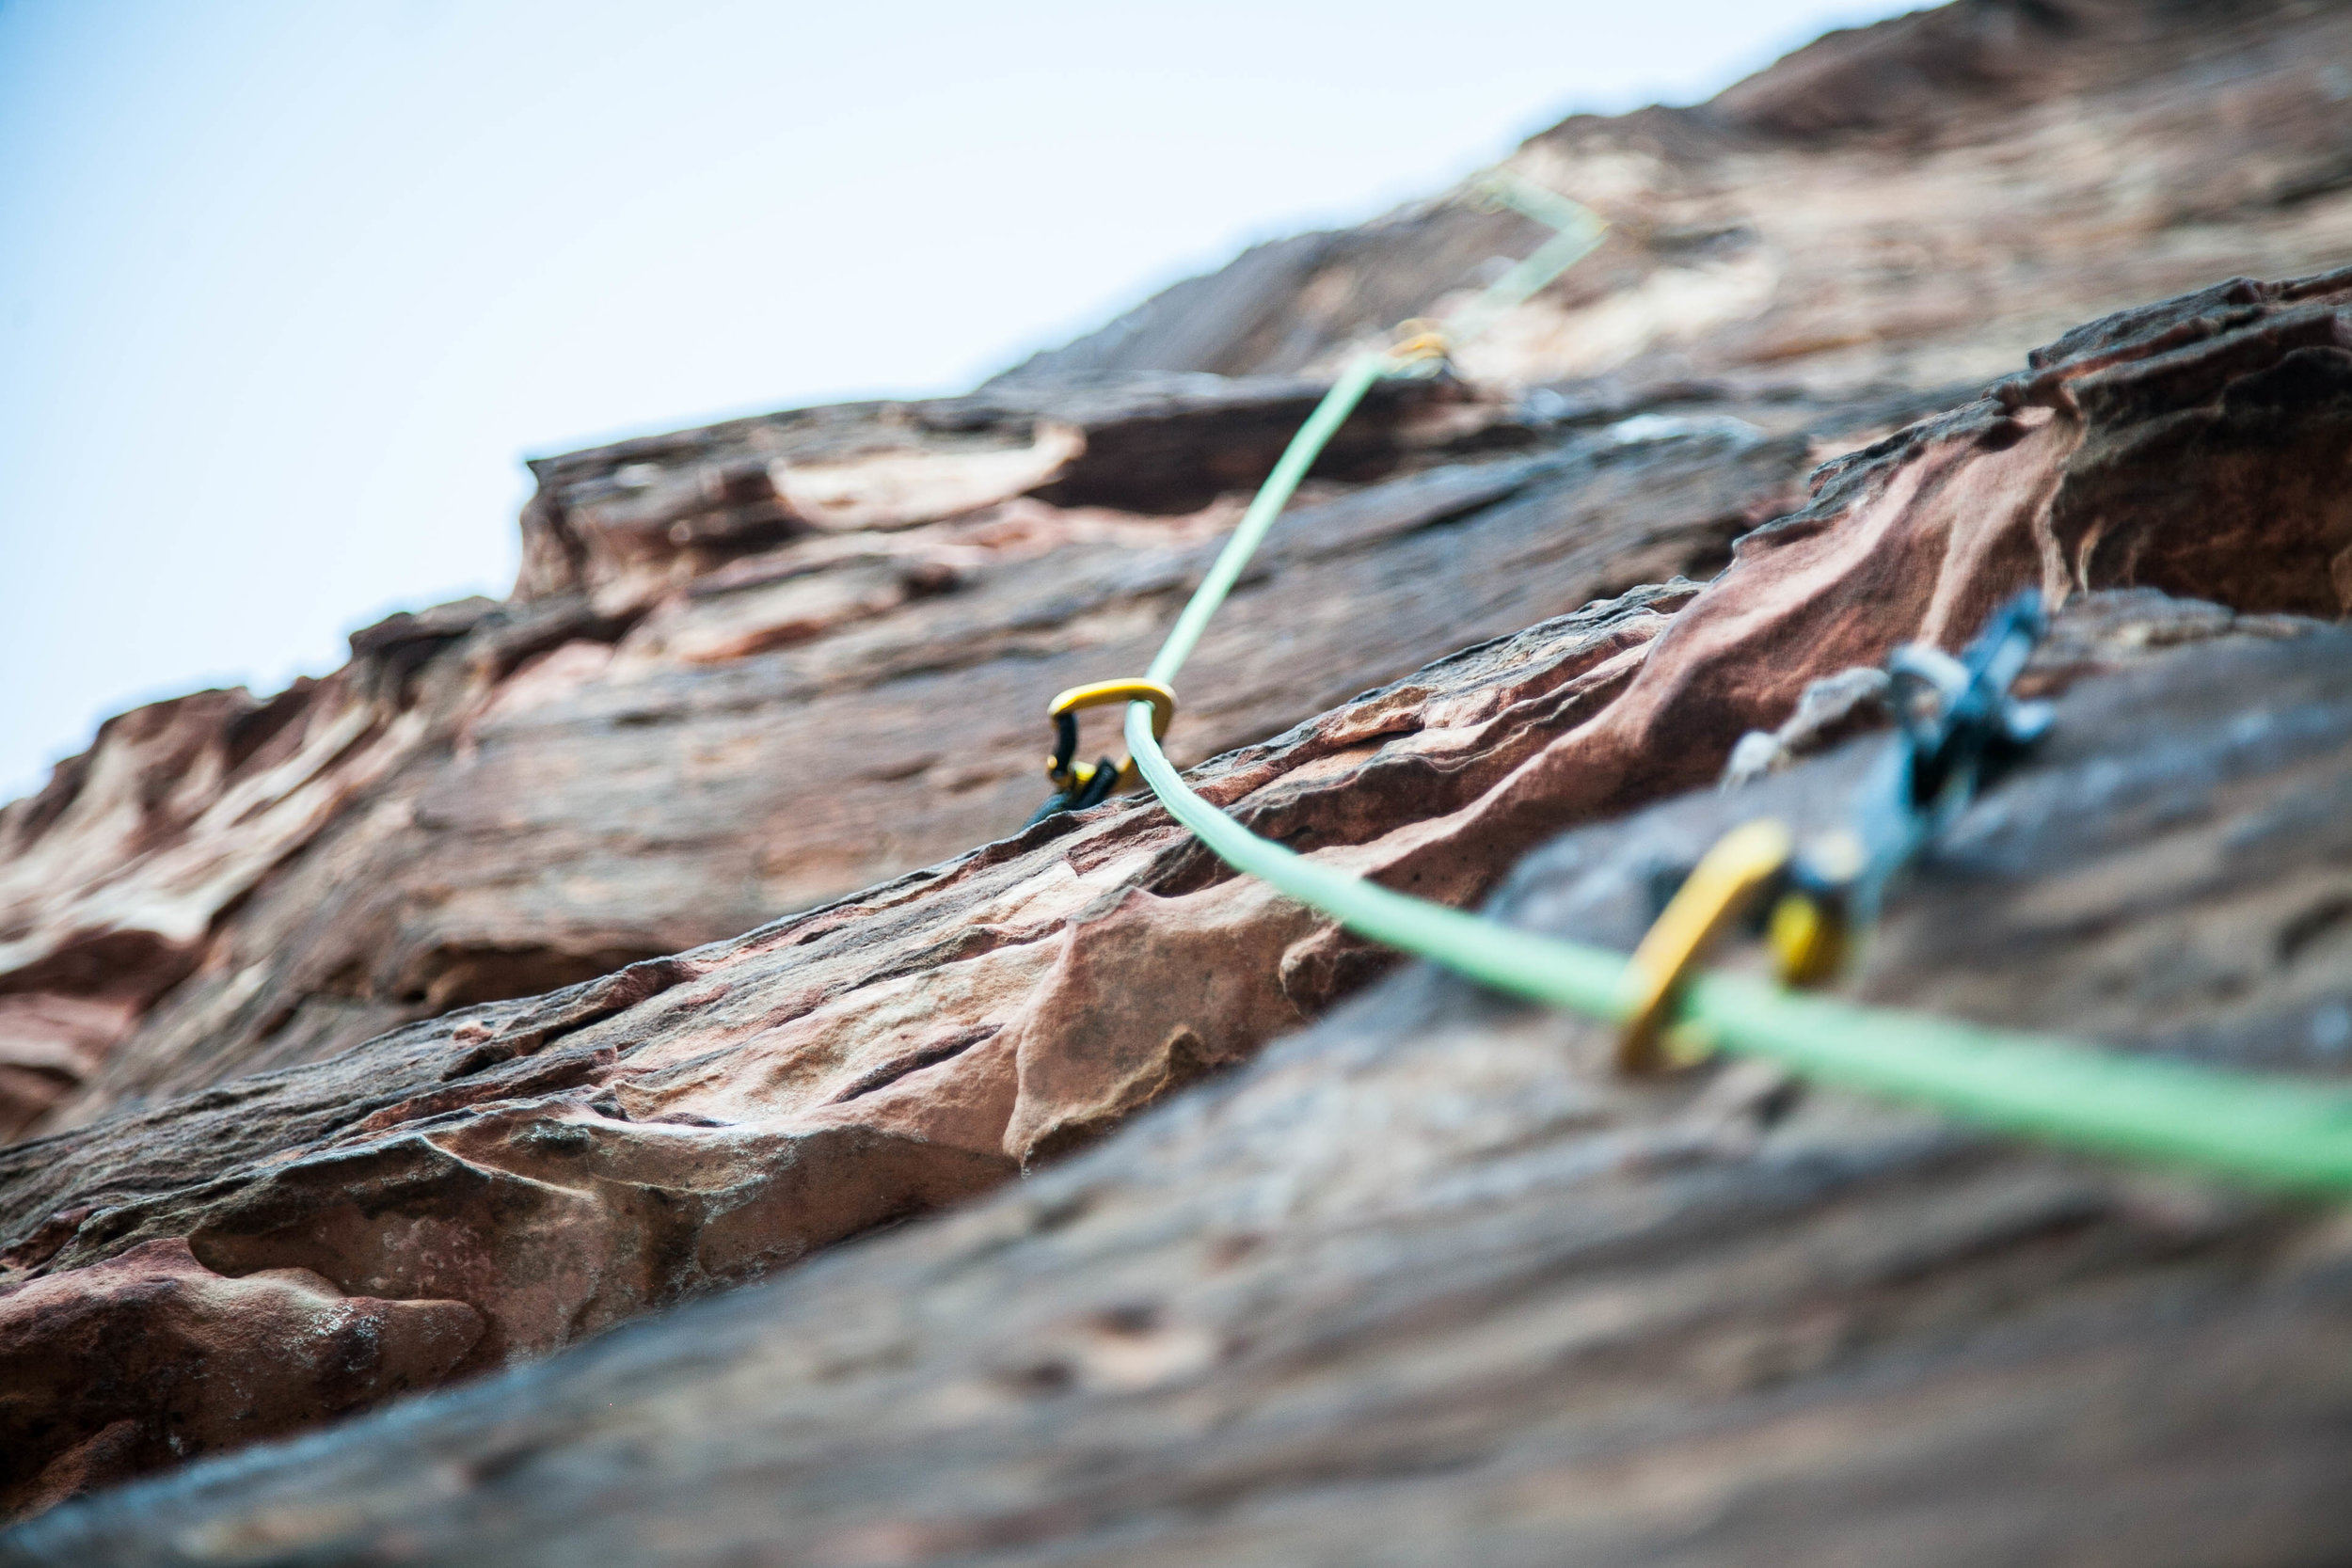 Rock Climbing - Location: Acadia NP, CliftonPrice: $40/personGroup Minimum/Maximum: 4/15